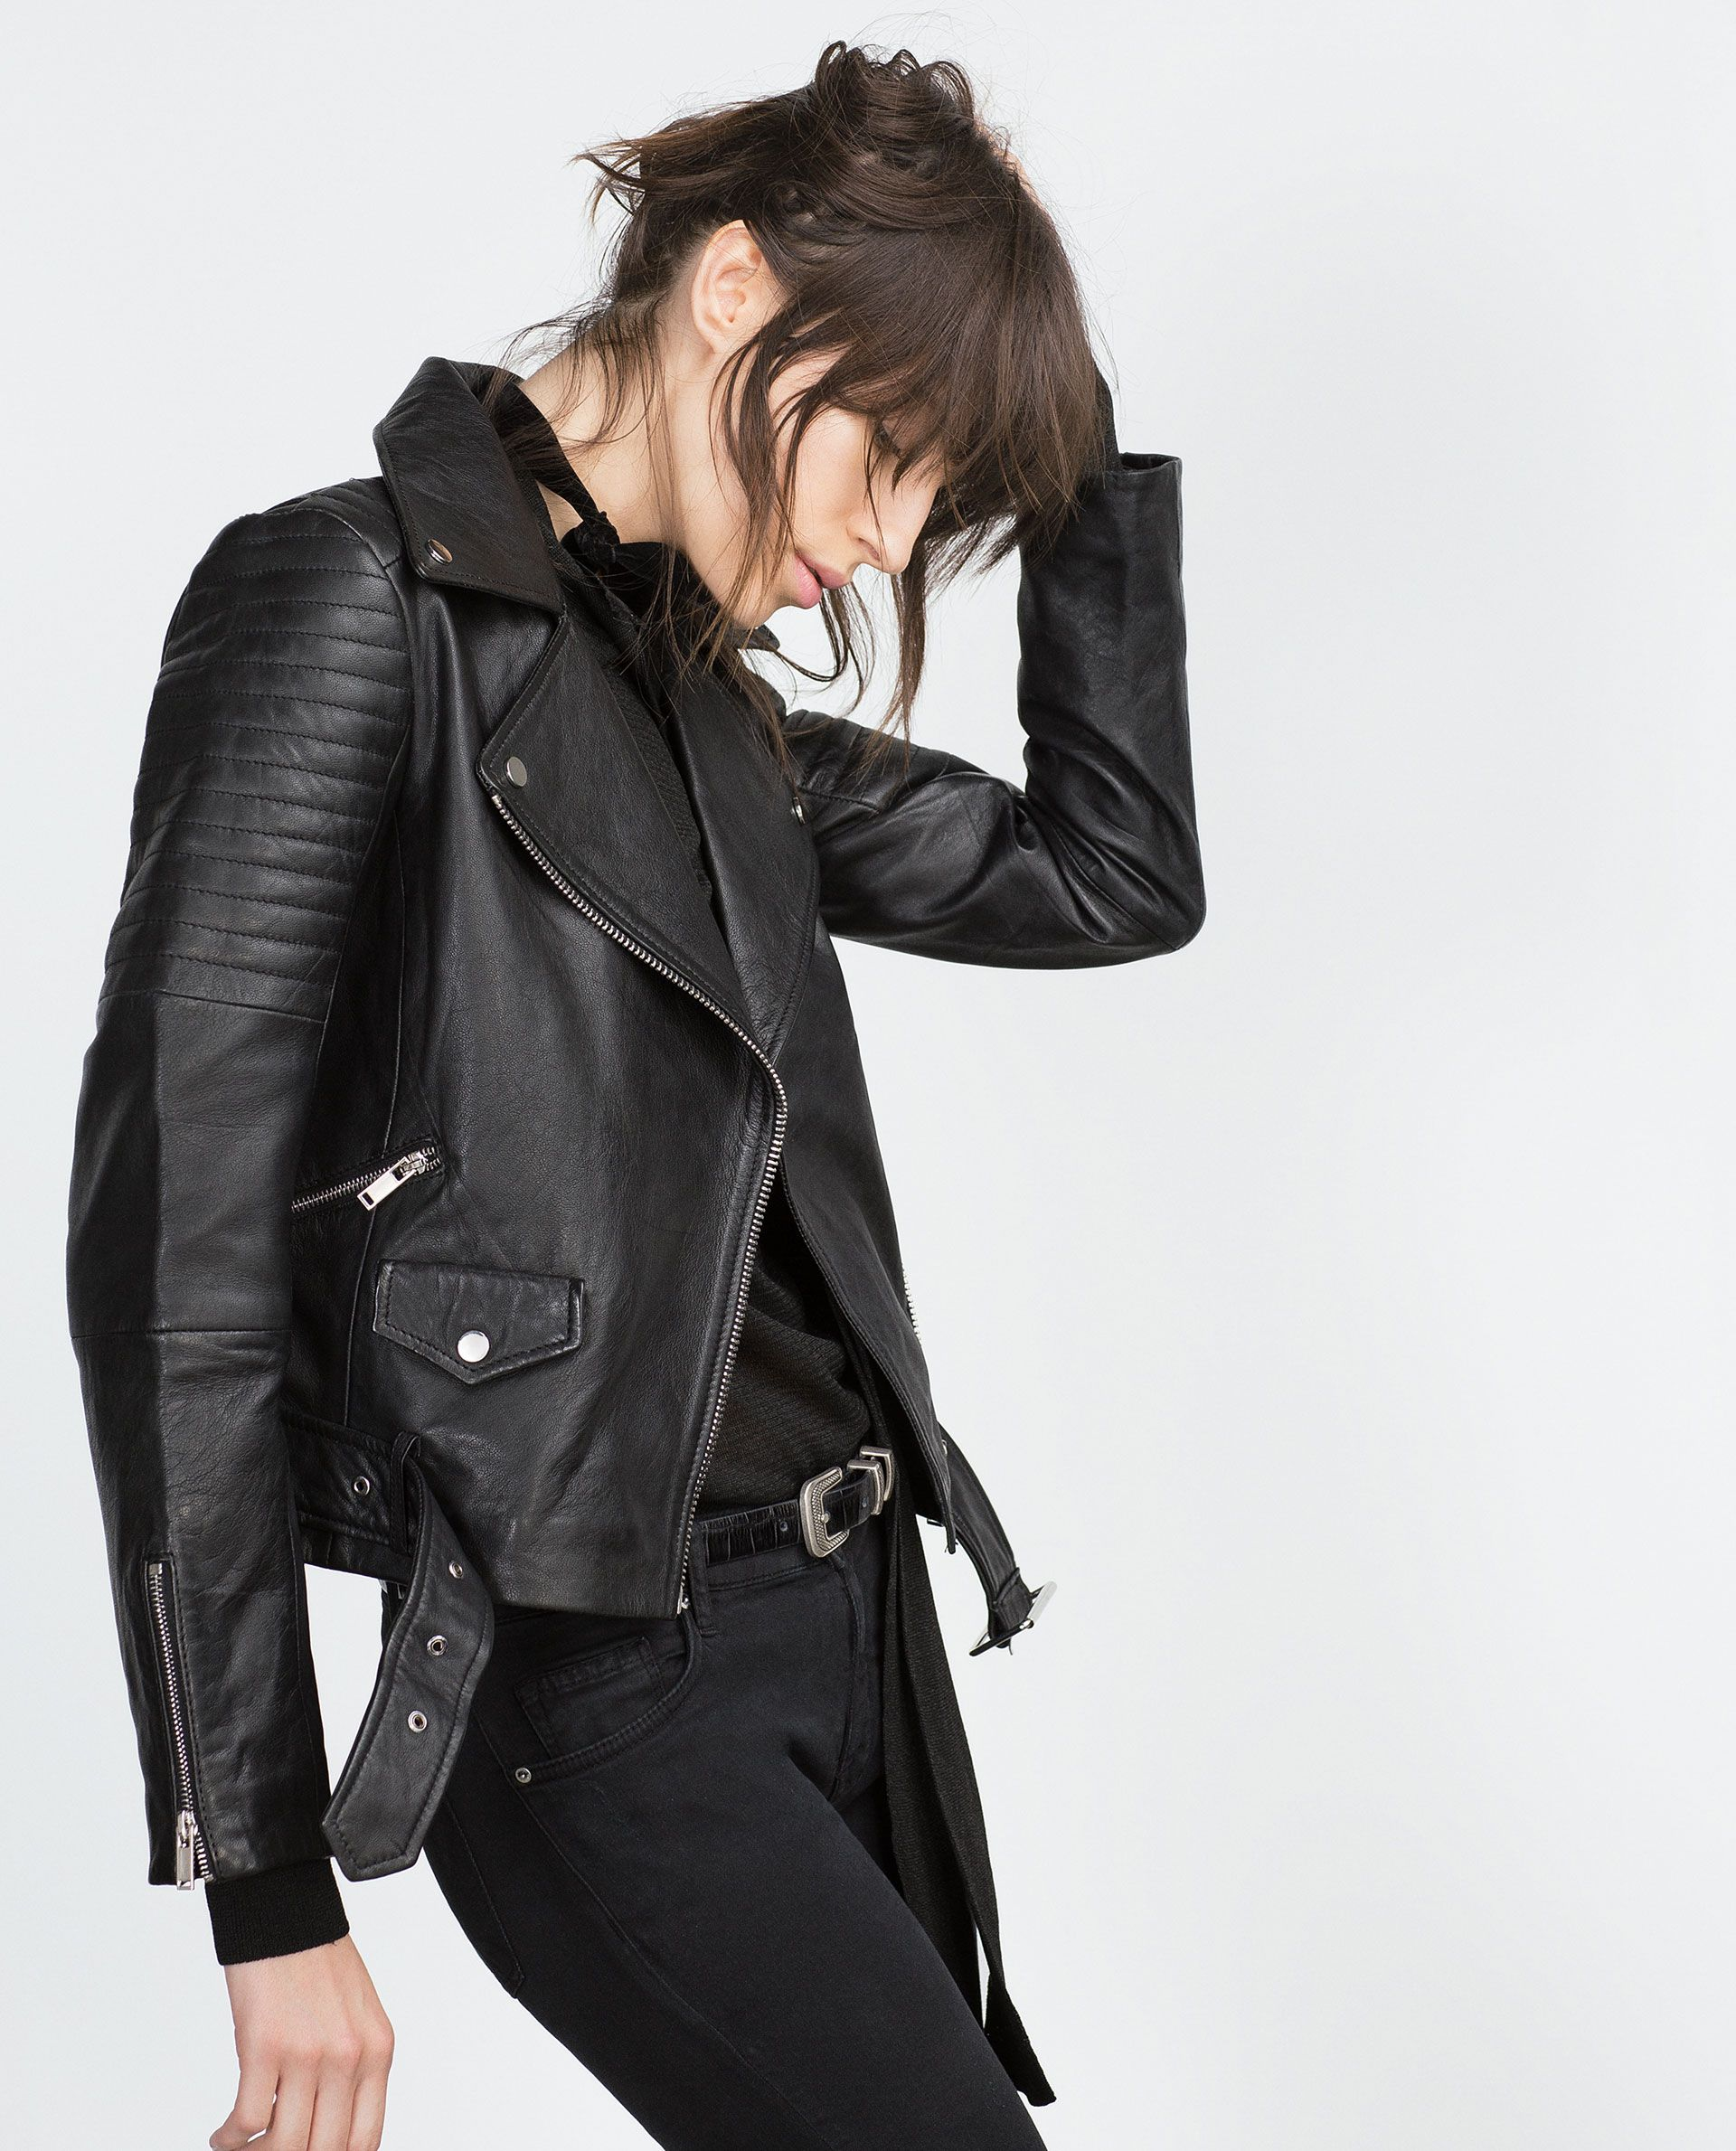 cazadora piel chaquetas mujer zara espa a biker jackets pinterest zara. Black Bedroom Furniture Sets. Home Design Ideas